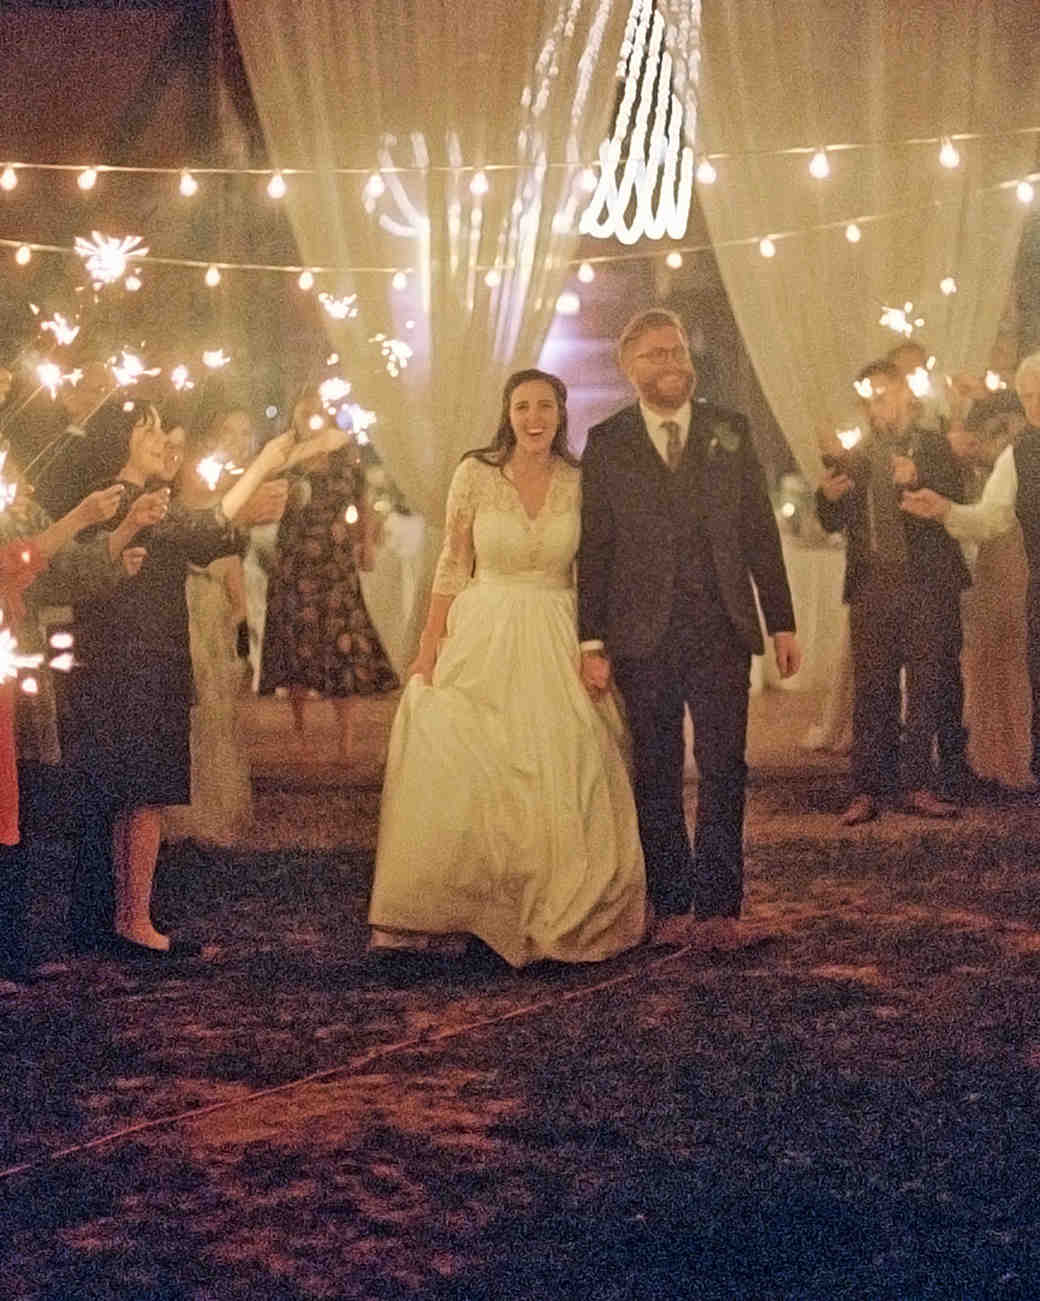 rachel elijah wedding sparklers